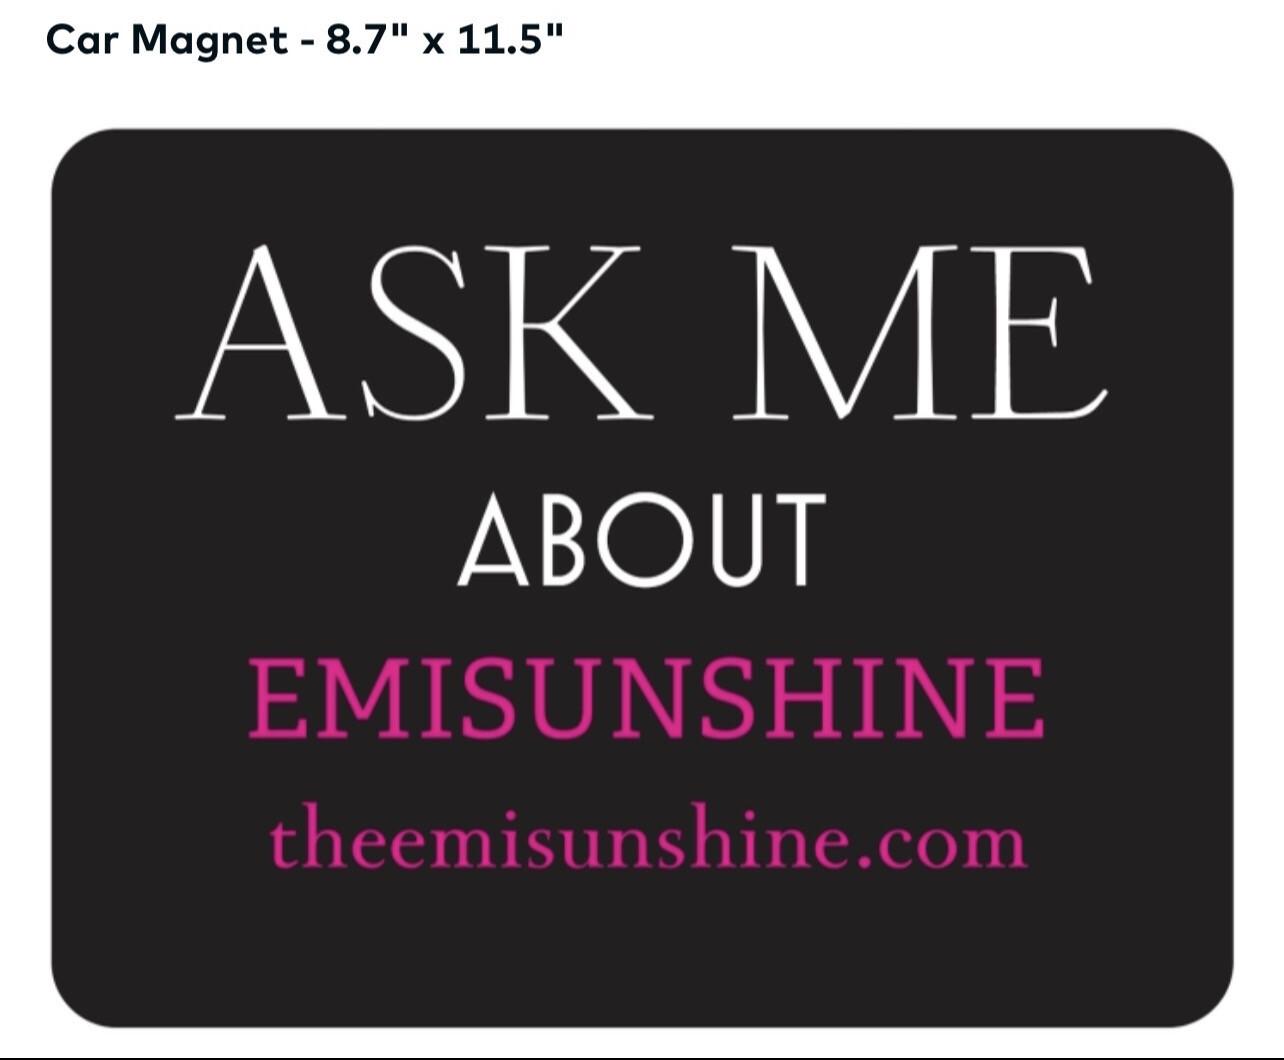 Official EmiSunshine Car magnet